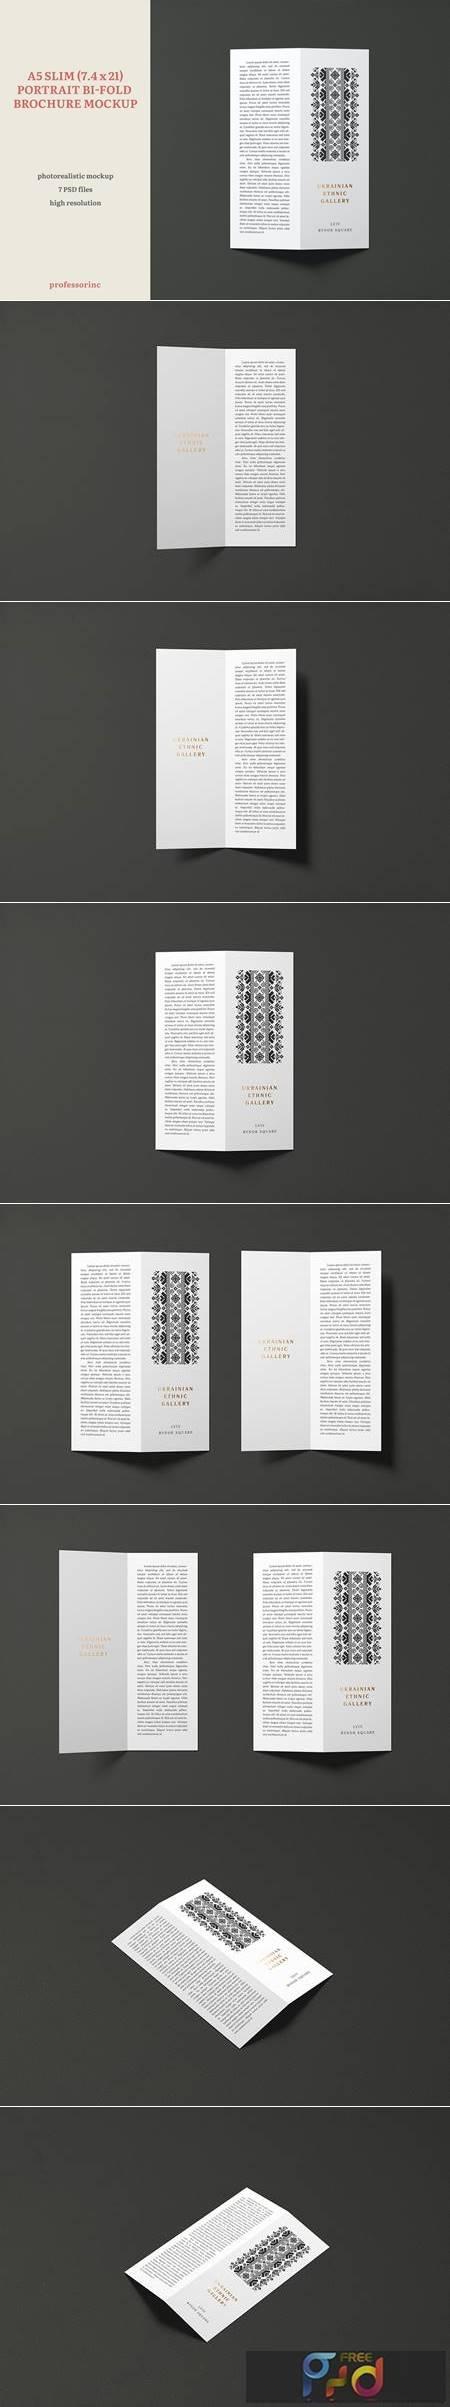 A5 Slim Portrait Bi-Fold Brochure Mockup GDH9EKM 1